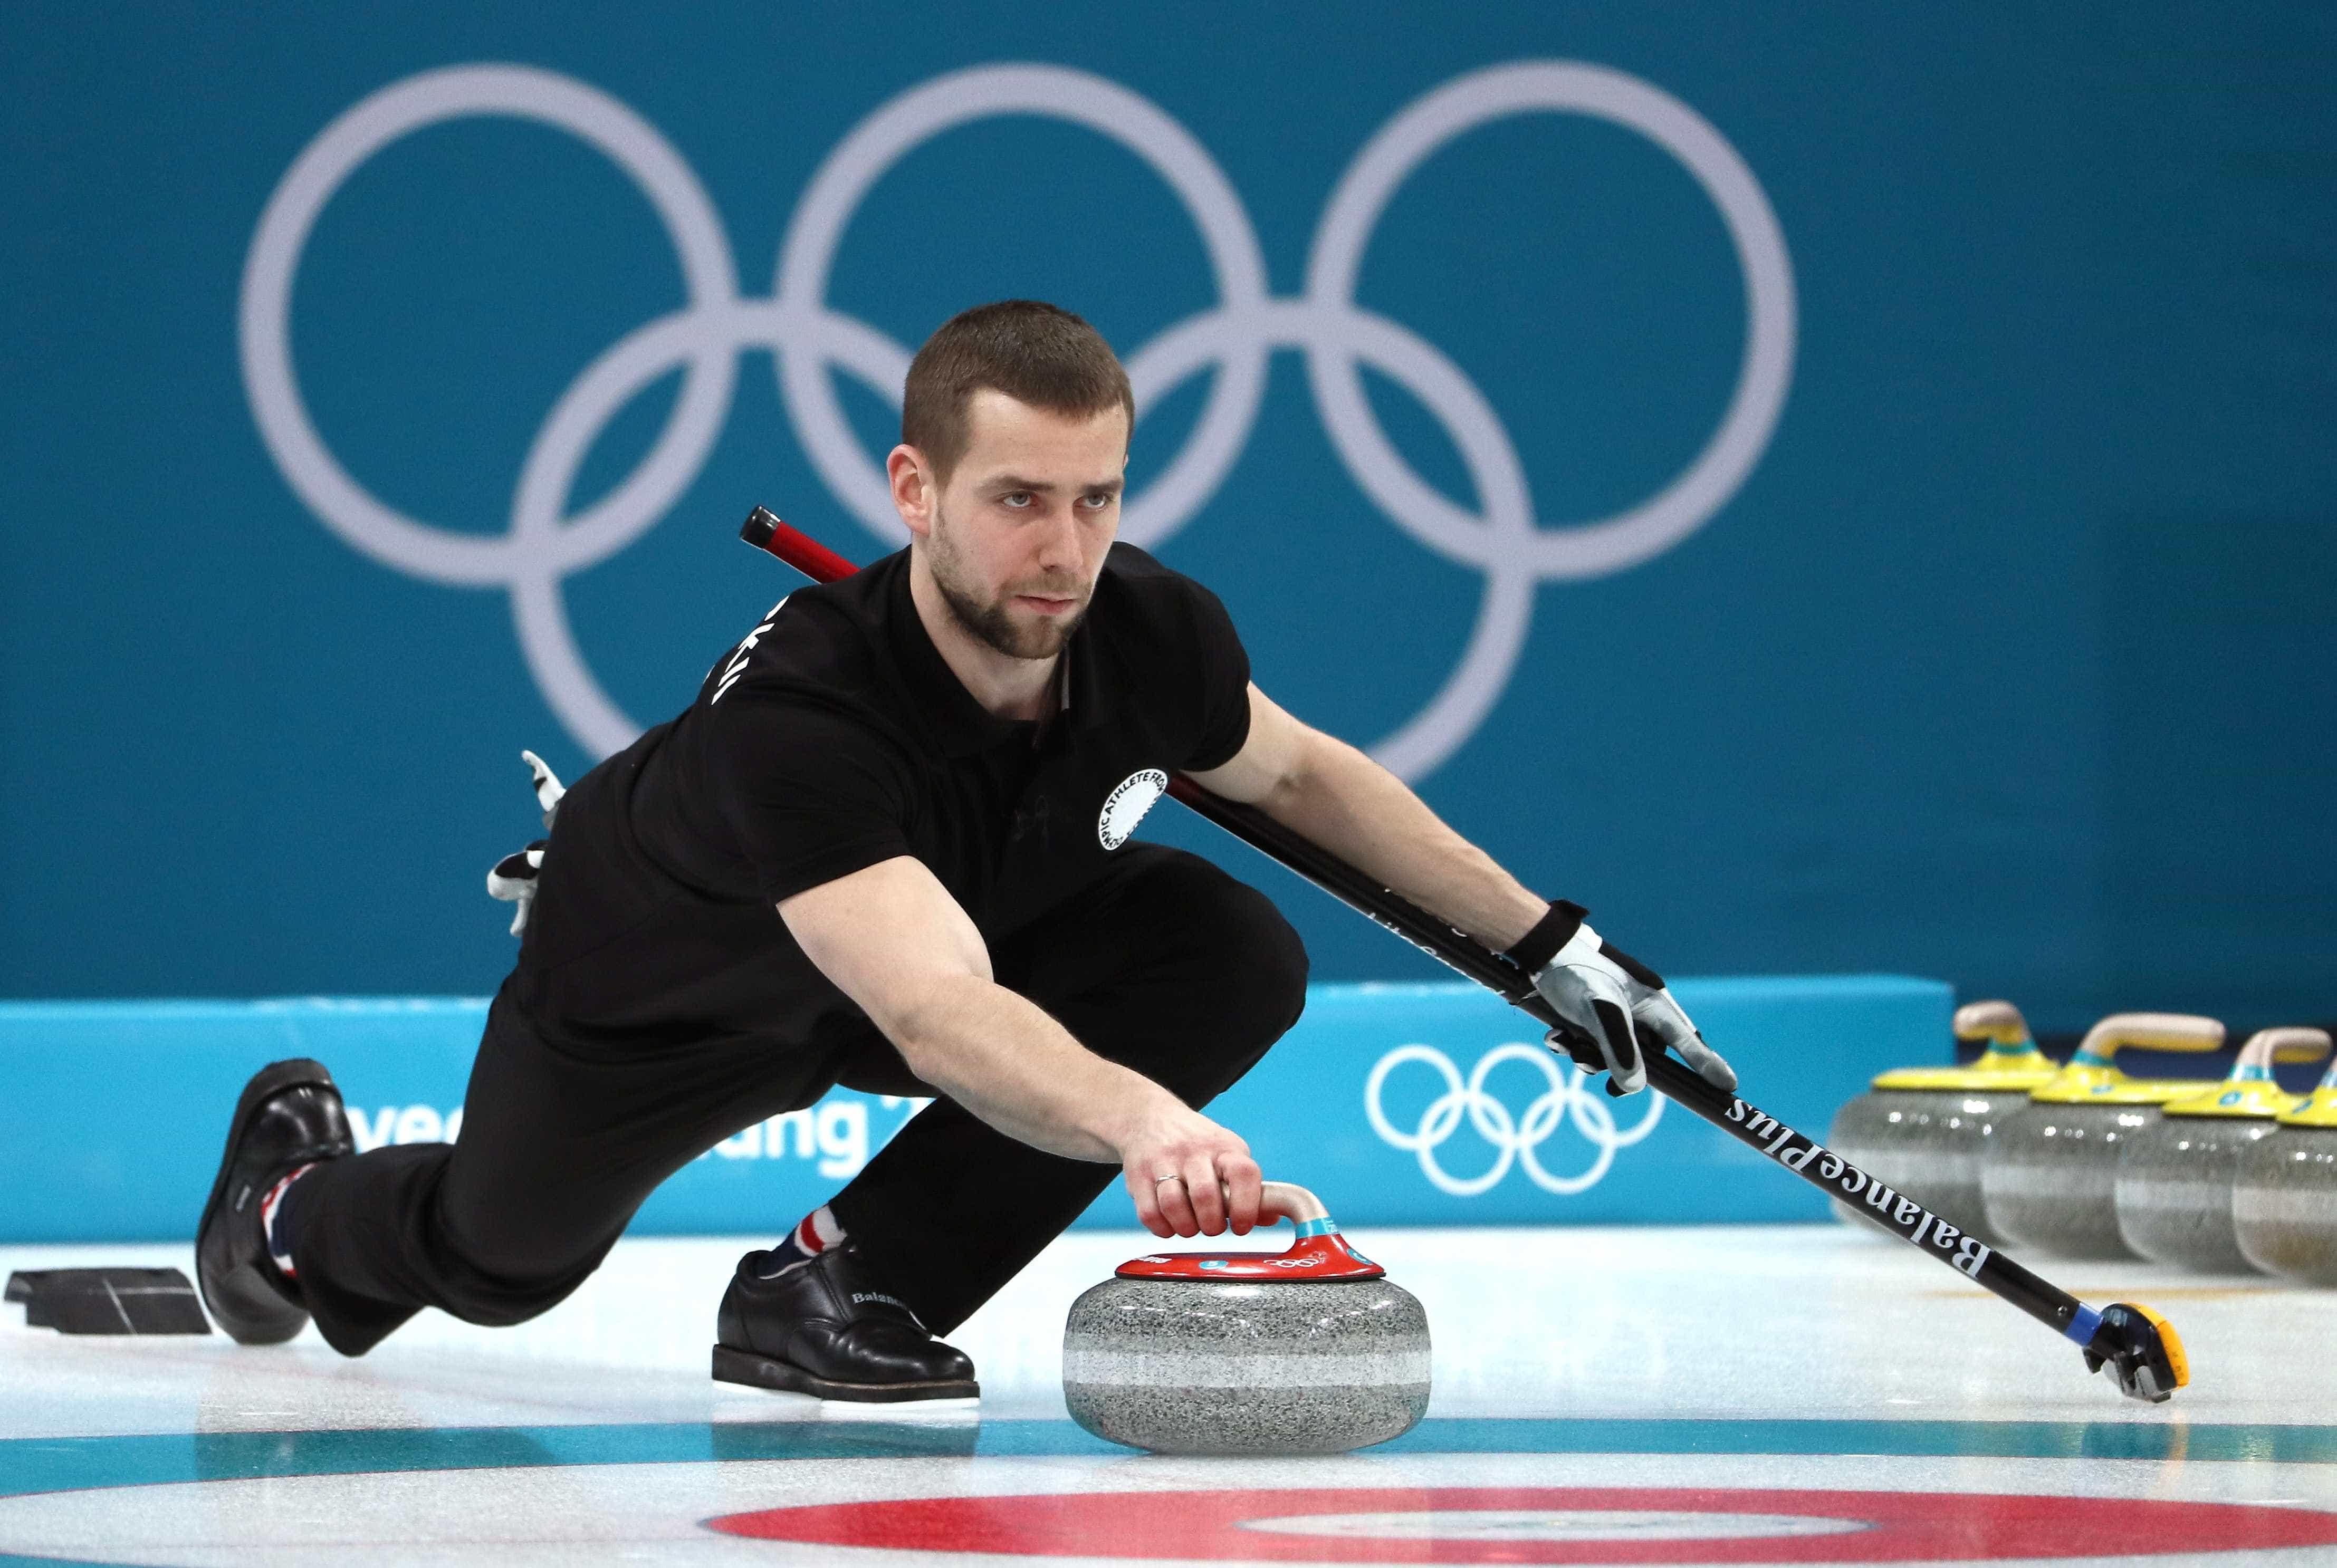 CAS confirma doping de medalhista olímpico russo do curling